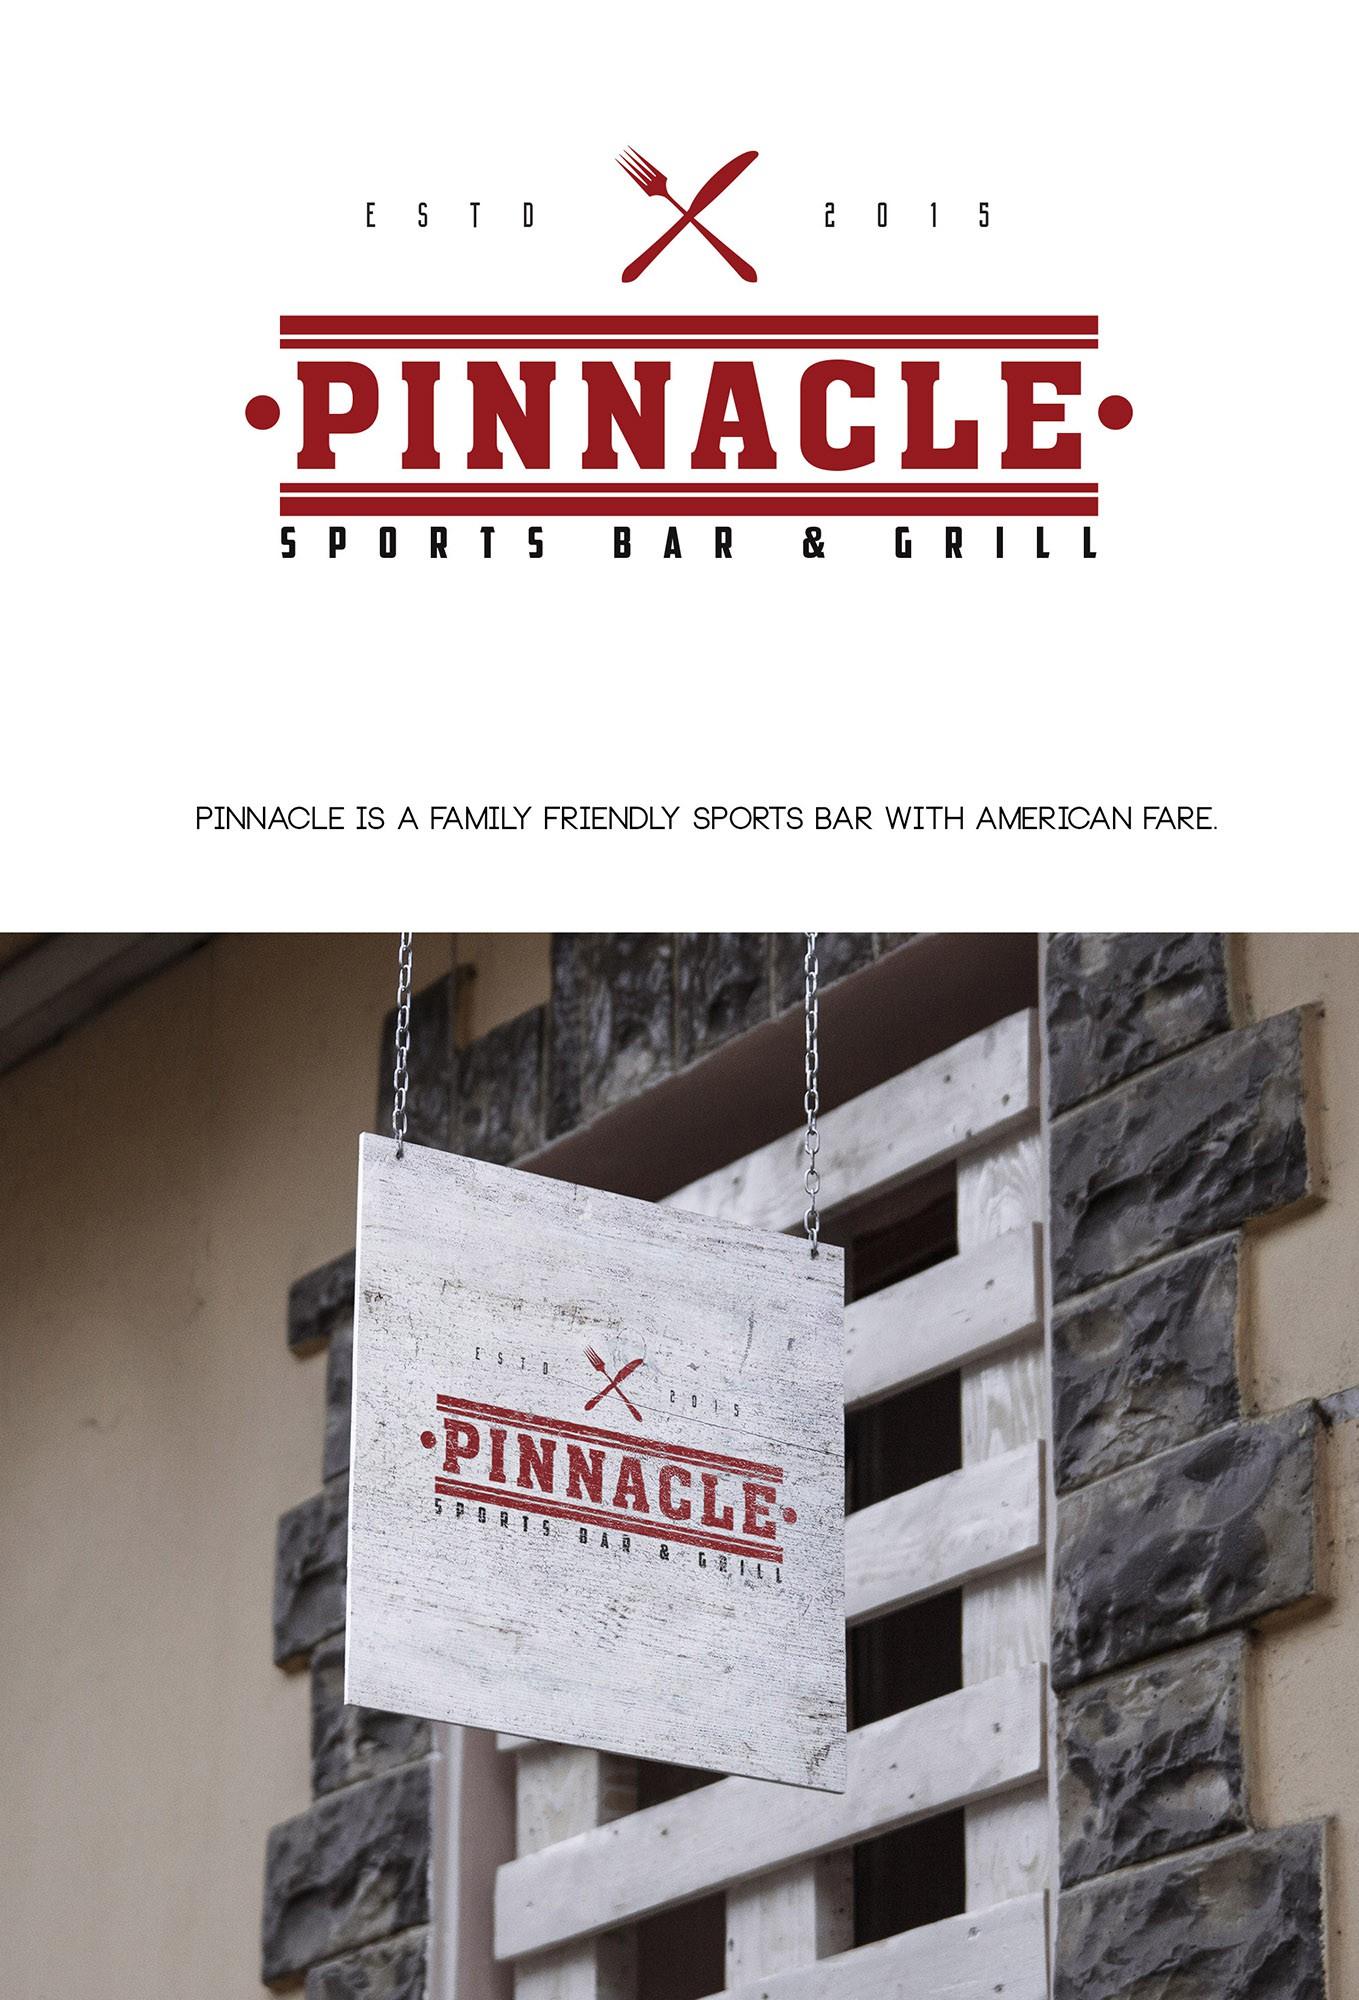 Pinnacle Sports Bar and Grill!